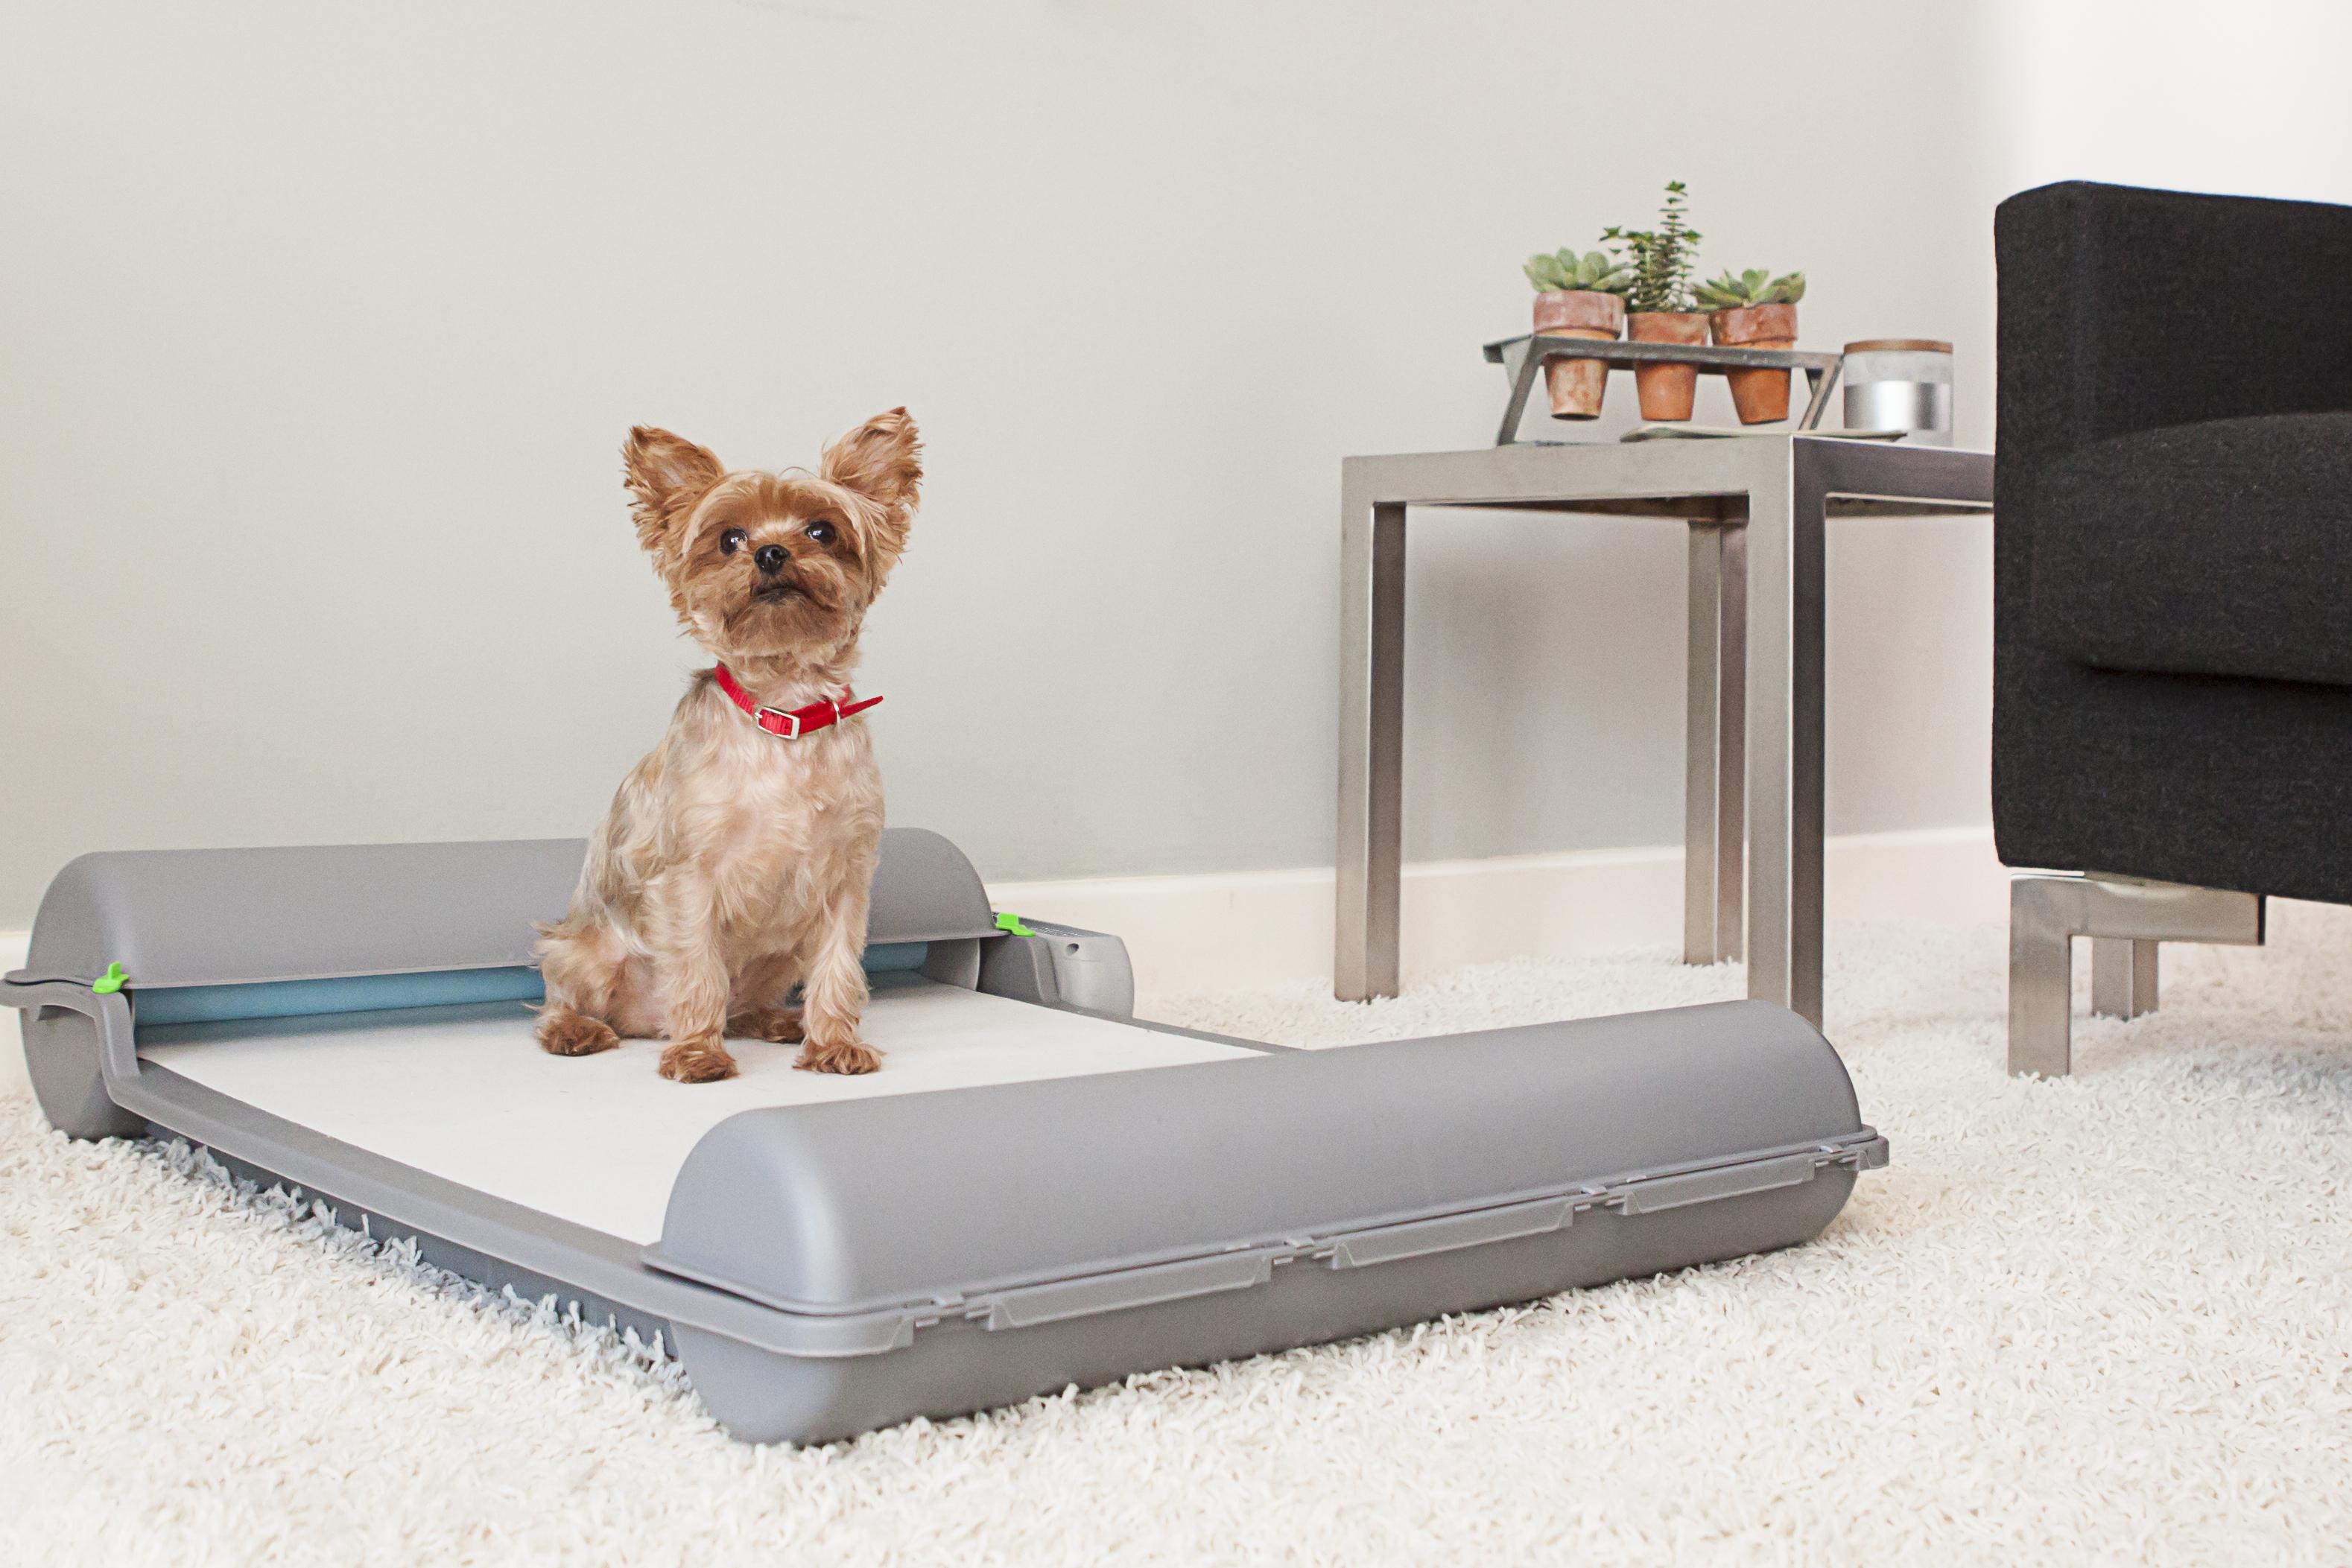 BrilliantPad Self Cleaning Dog Potty Lands $500 000 Deal on